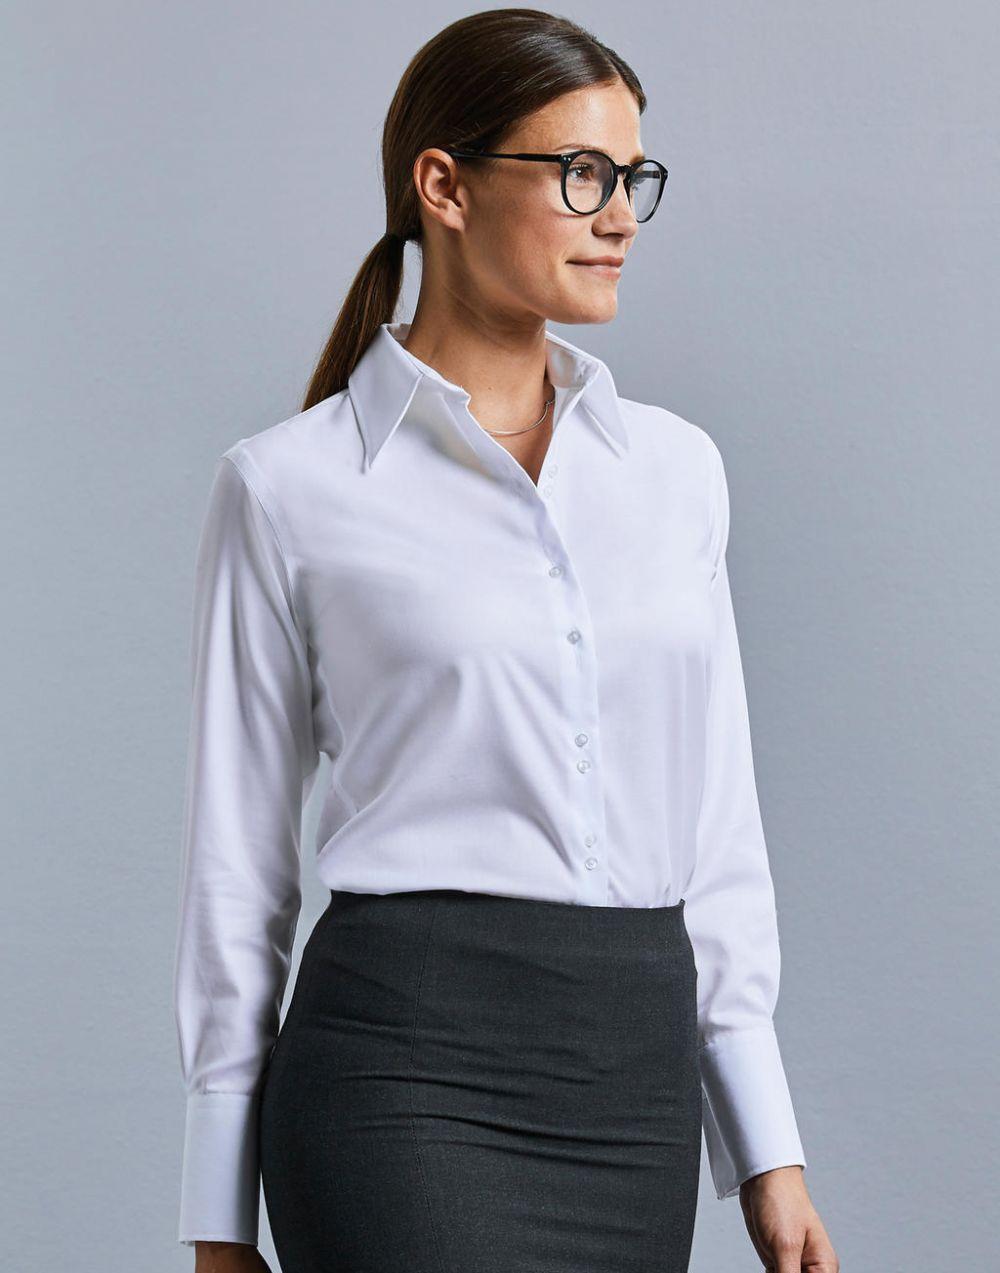 Camisas manga larga russell manga larga ultimate mujer imagen 1